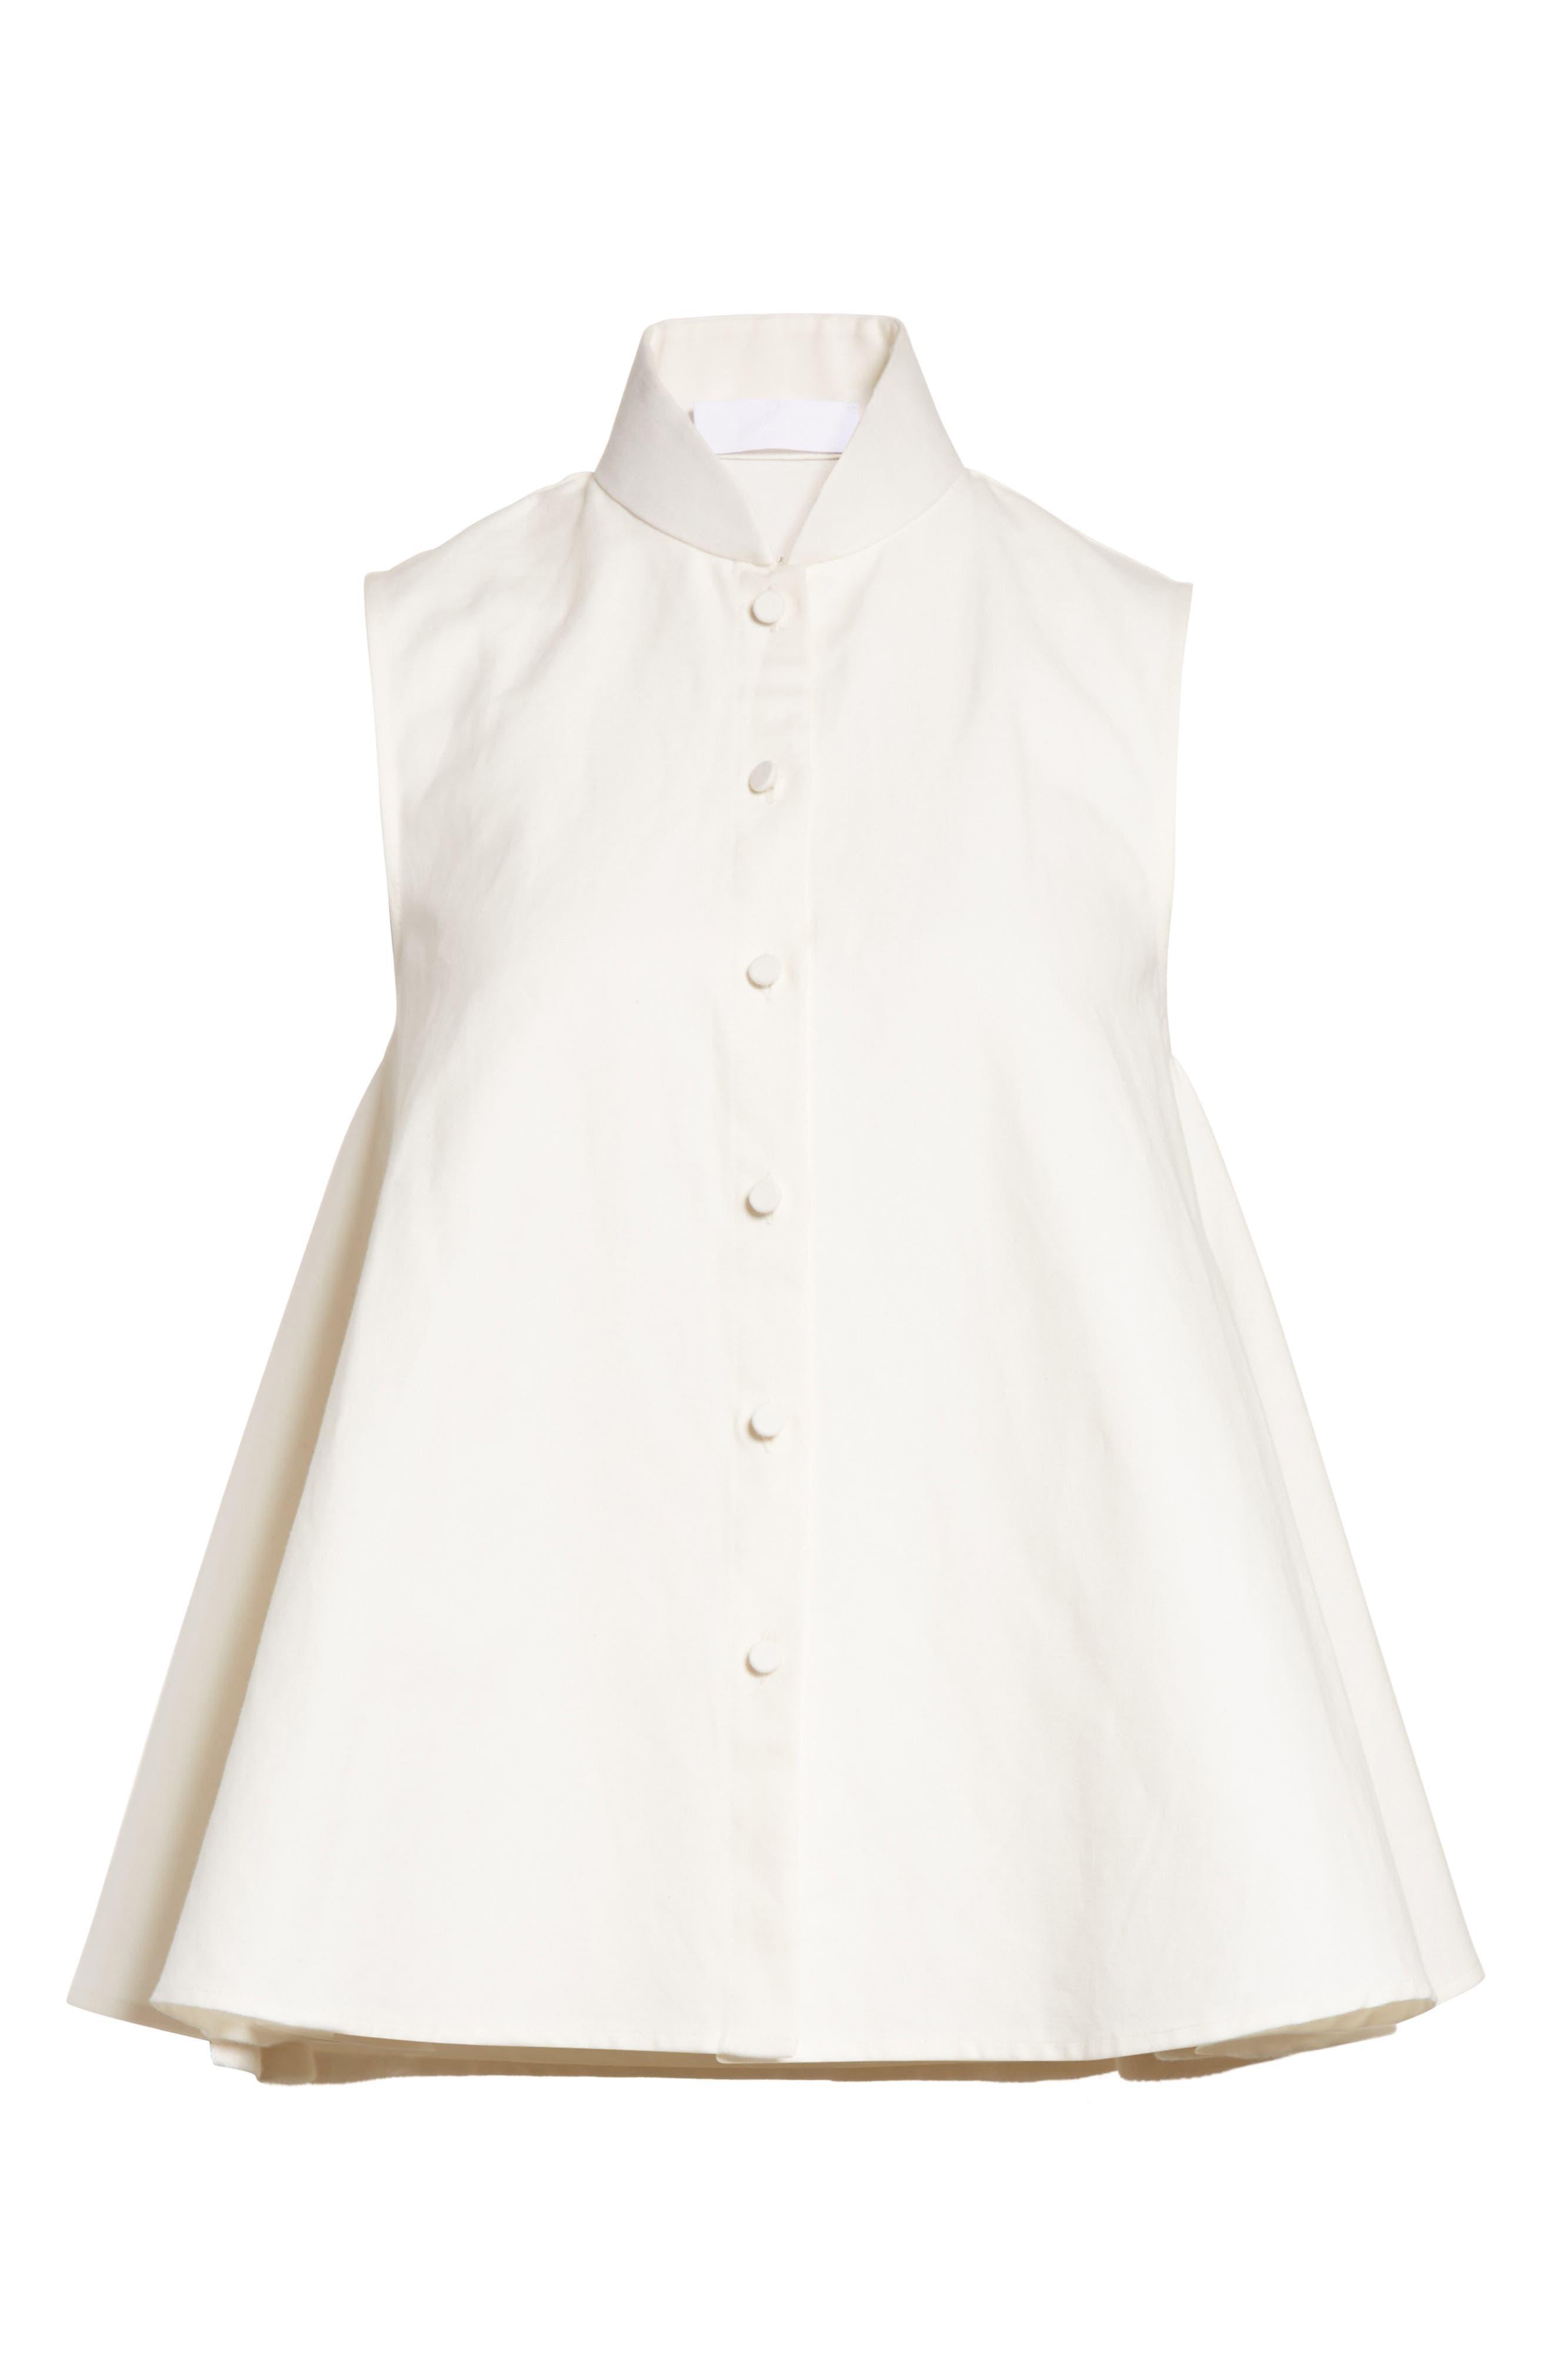 Linen & Cotton Swing Top,                             Alternate thumbnail 7, color,                             Ivory